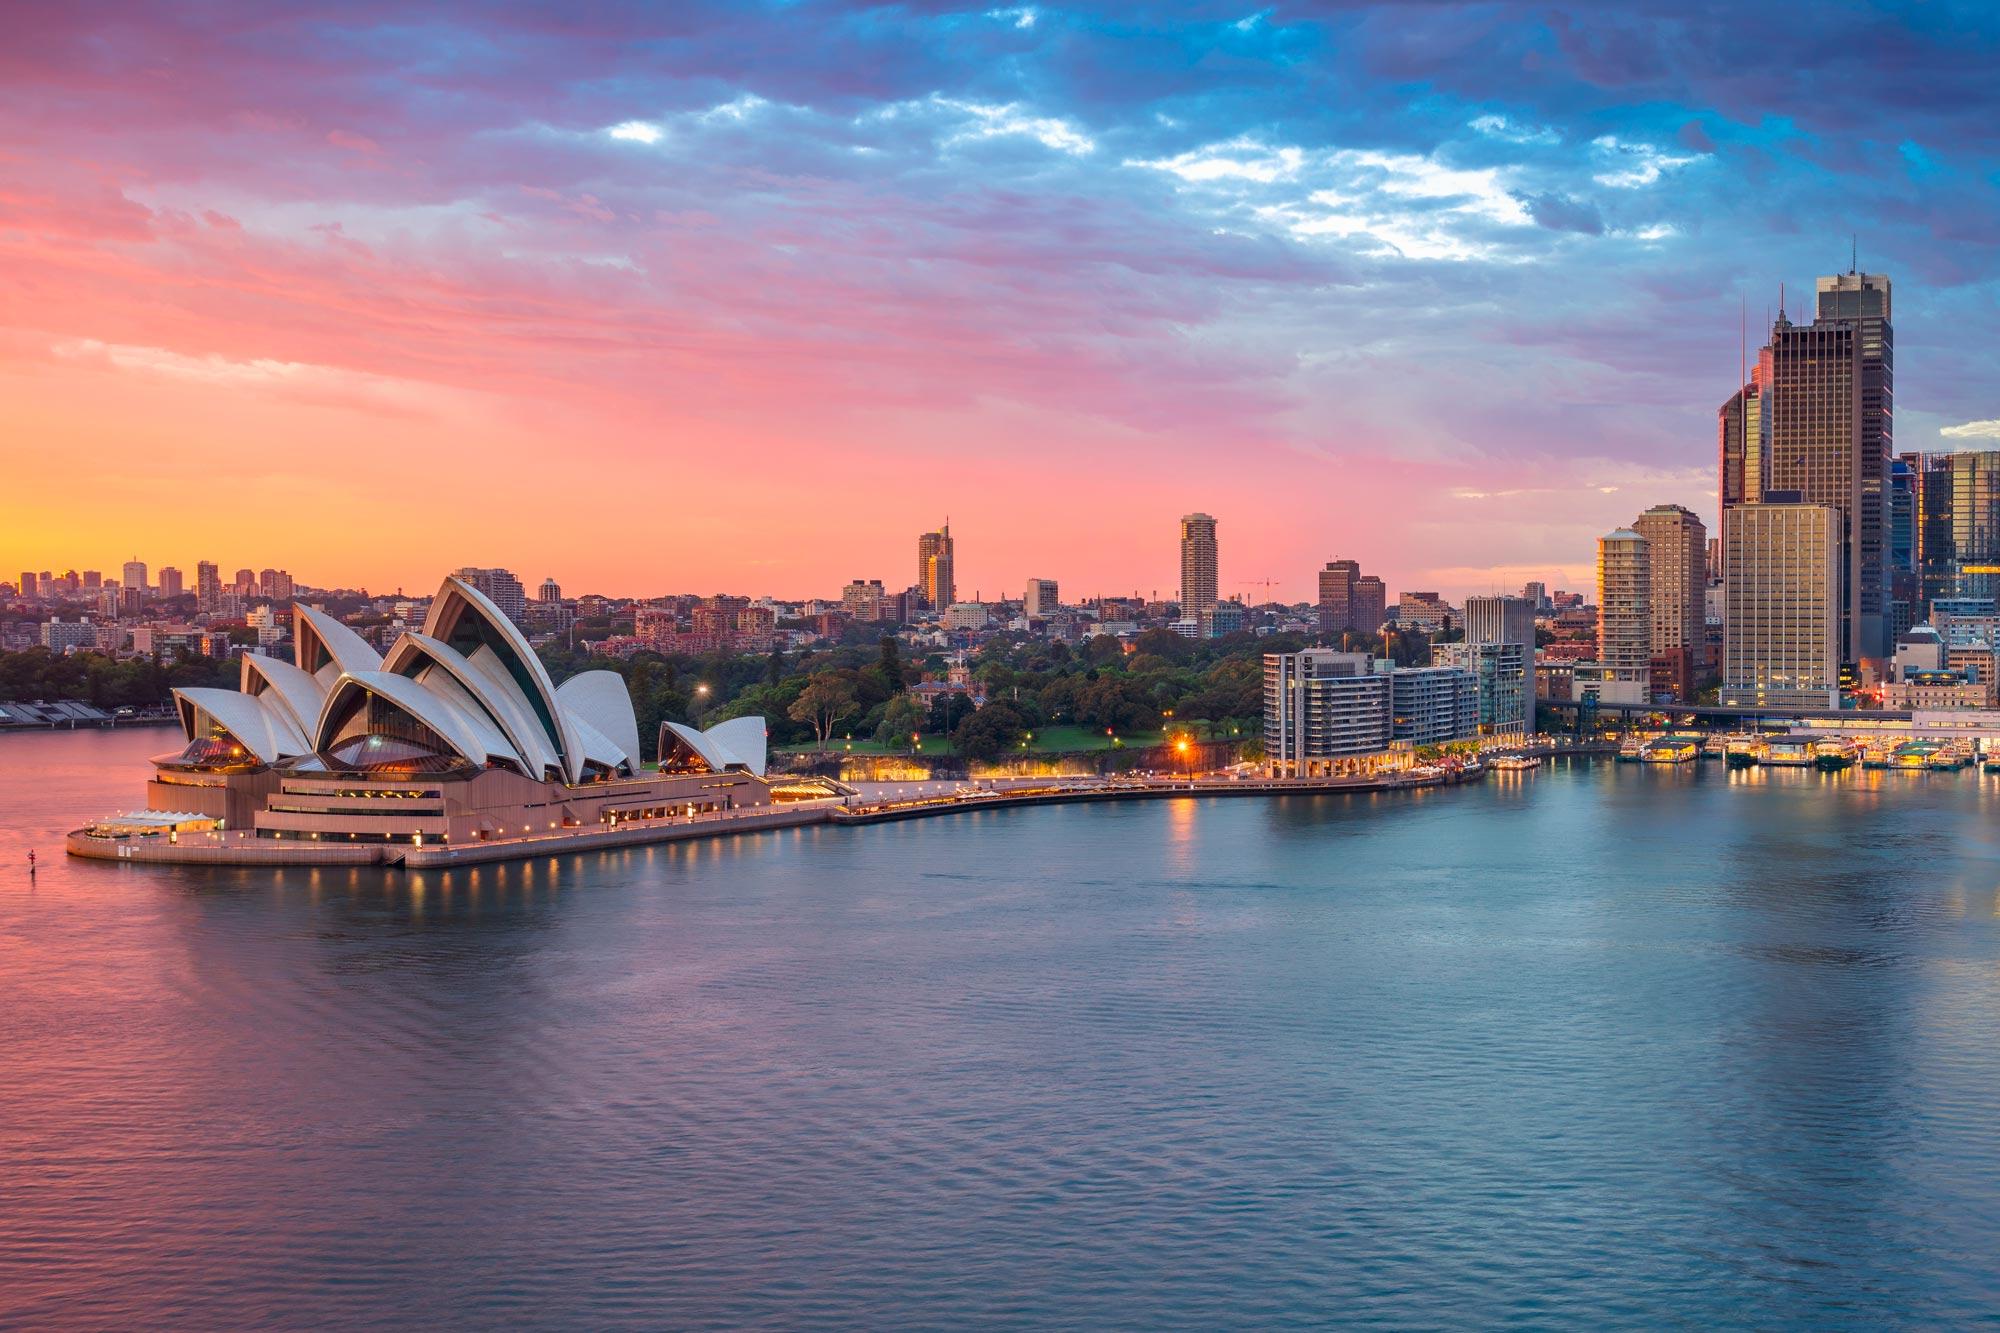 Australia City, Rock & Reef Holidays